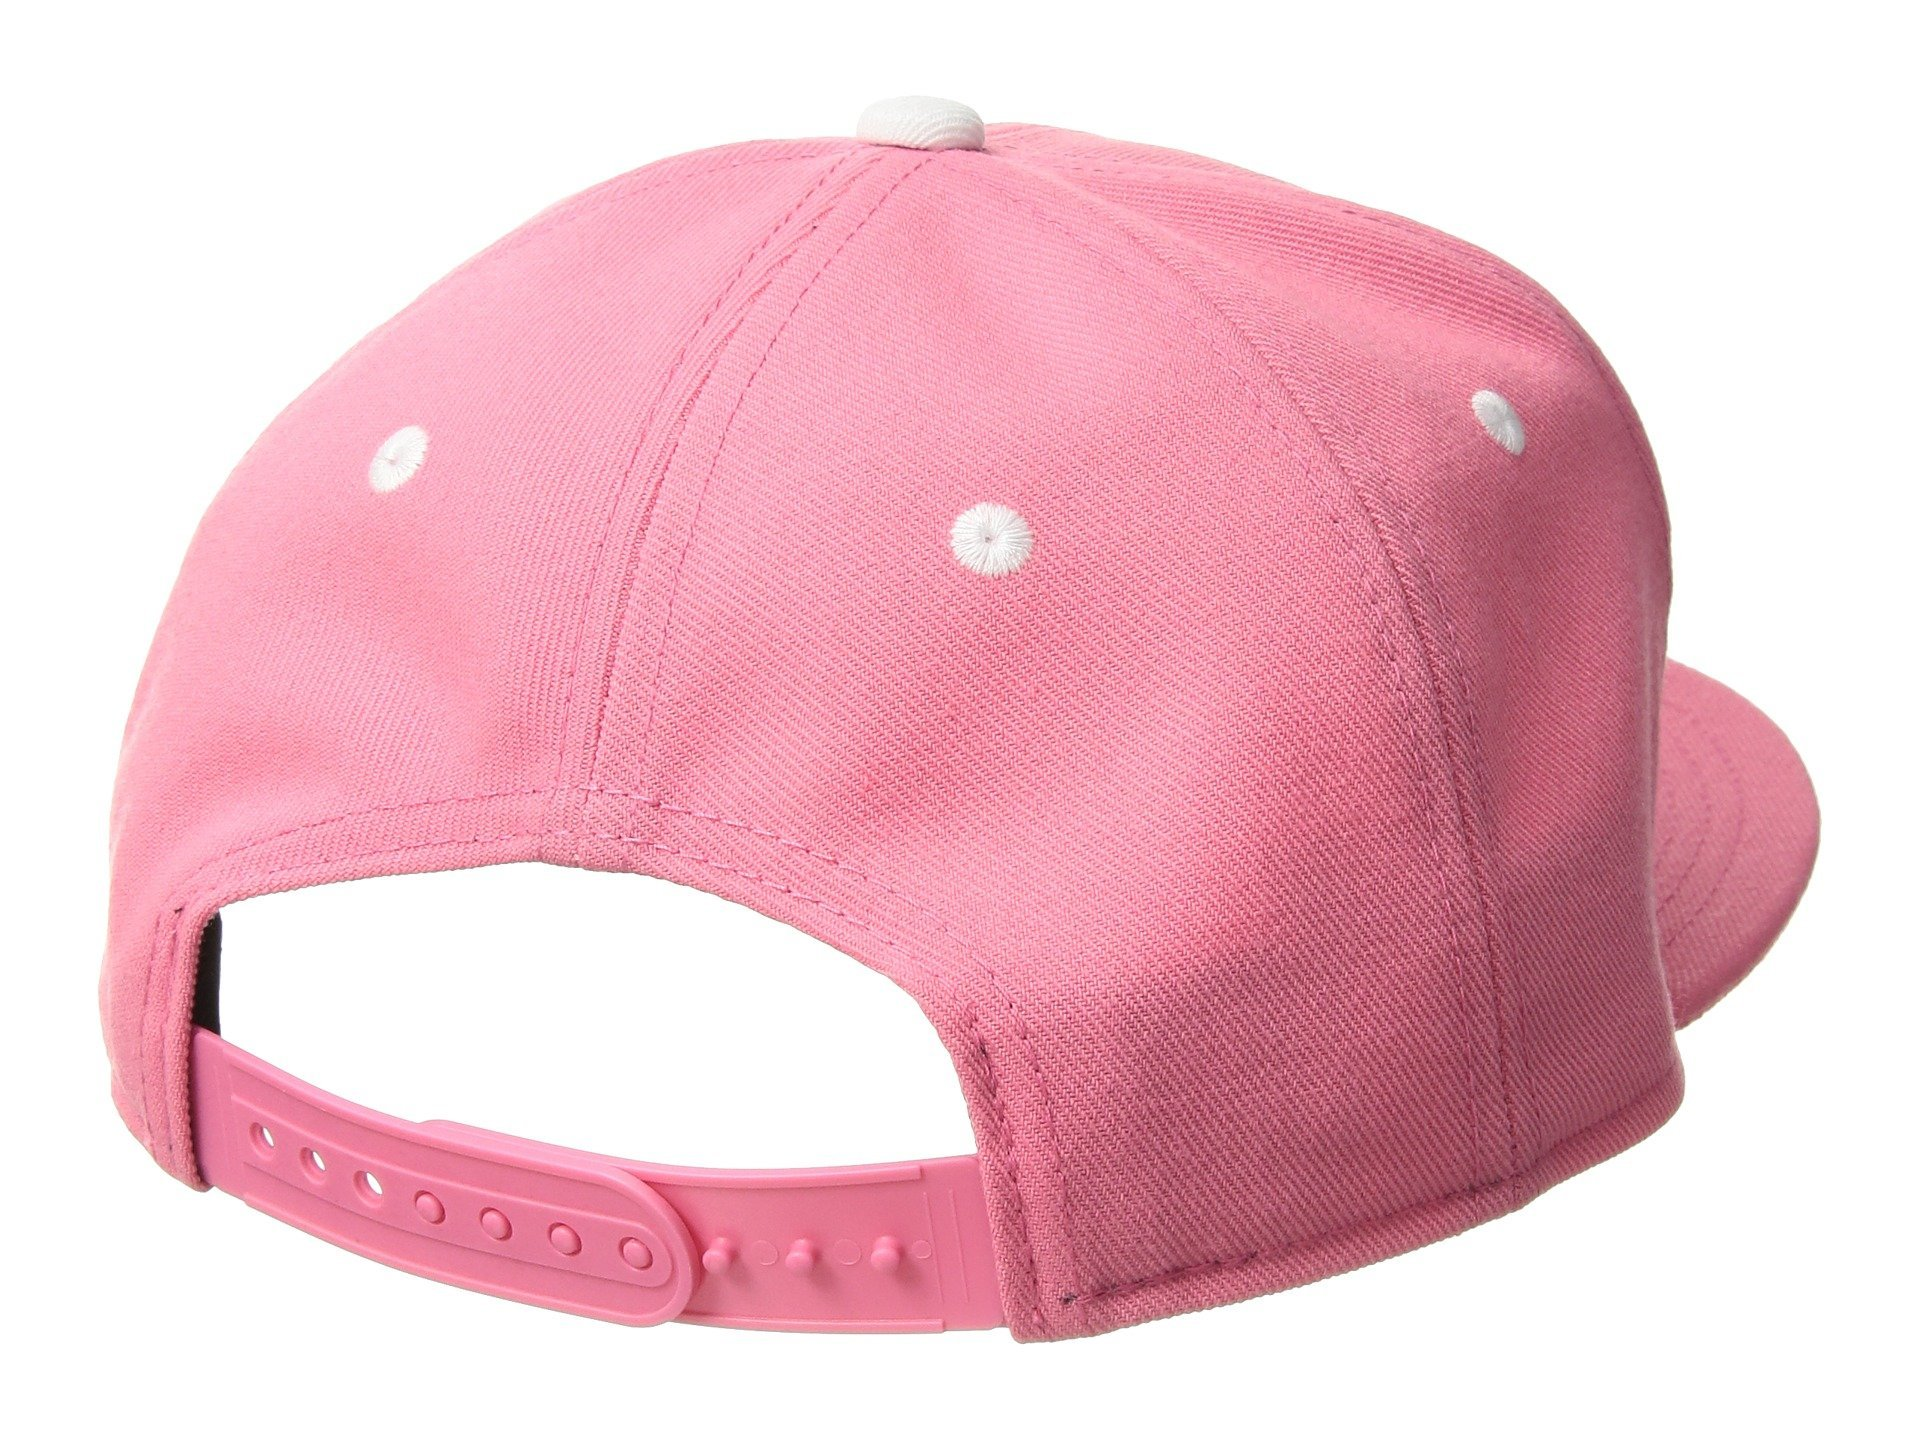 Nike Futura True Cap Youth Pink Nebula Black White by Nike (Image #3)